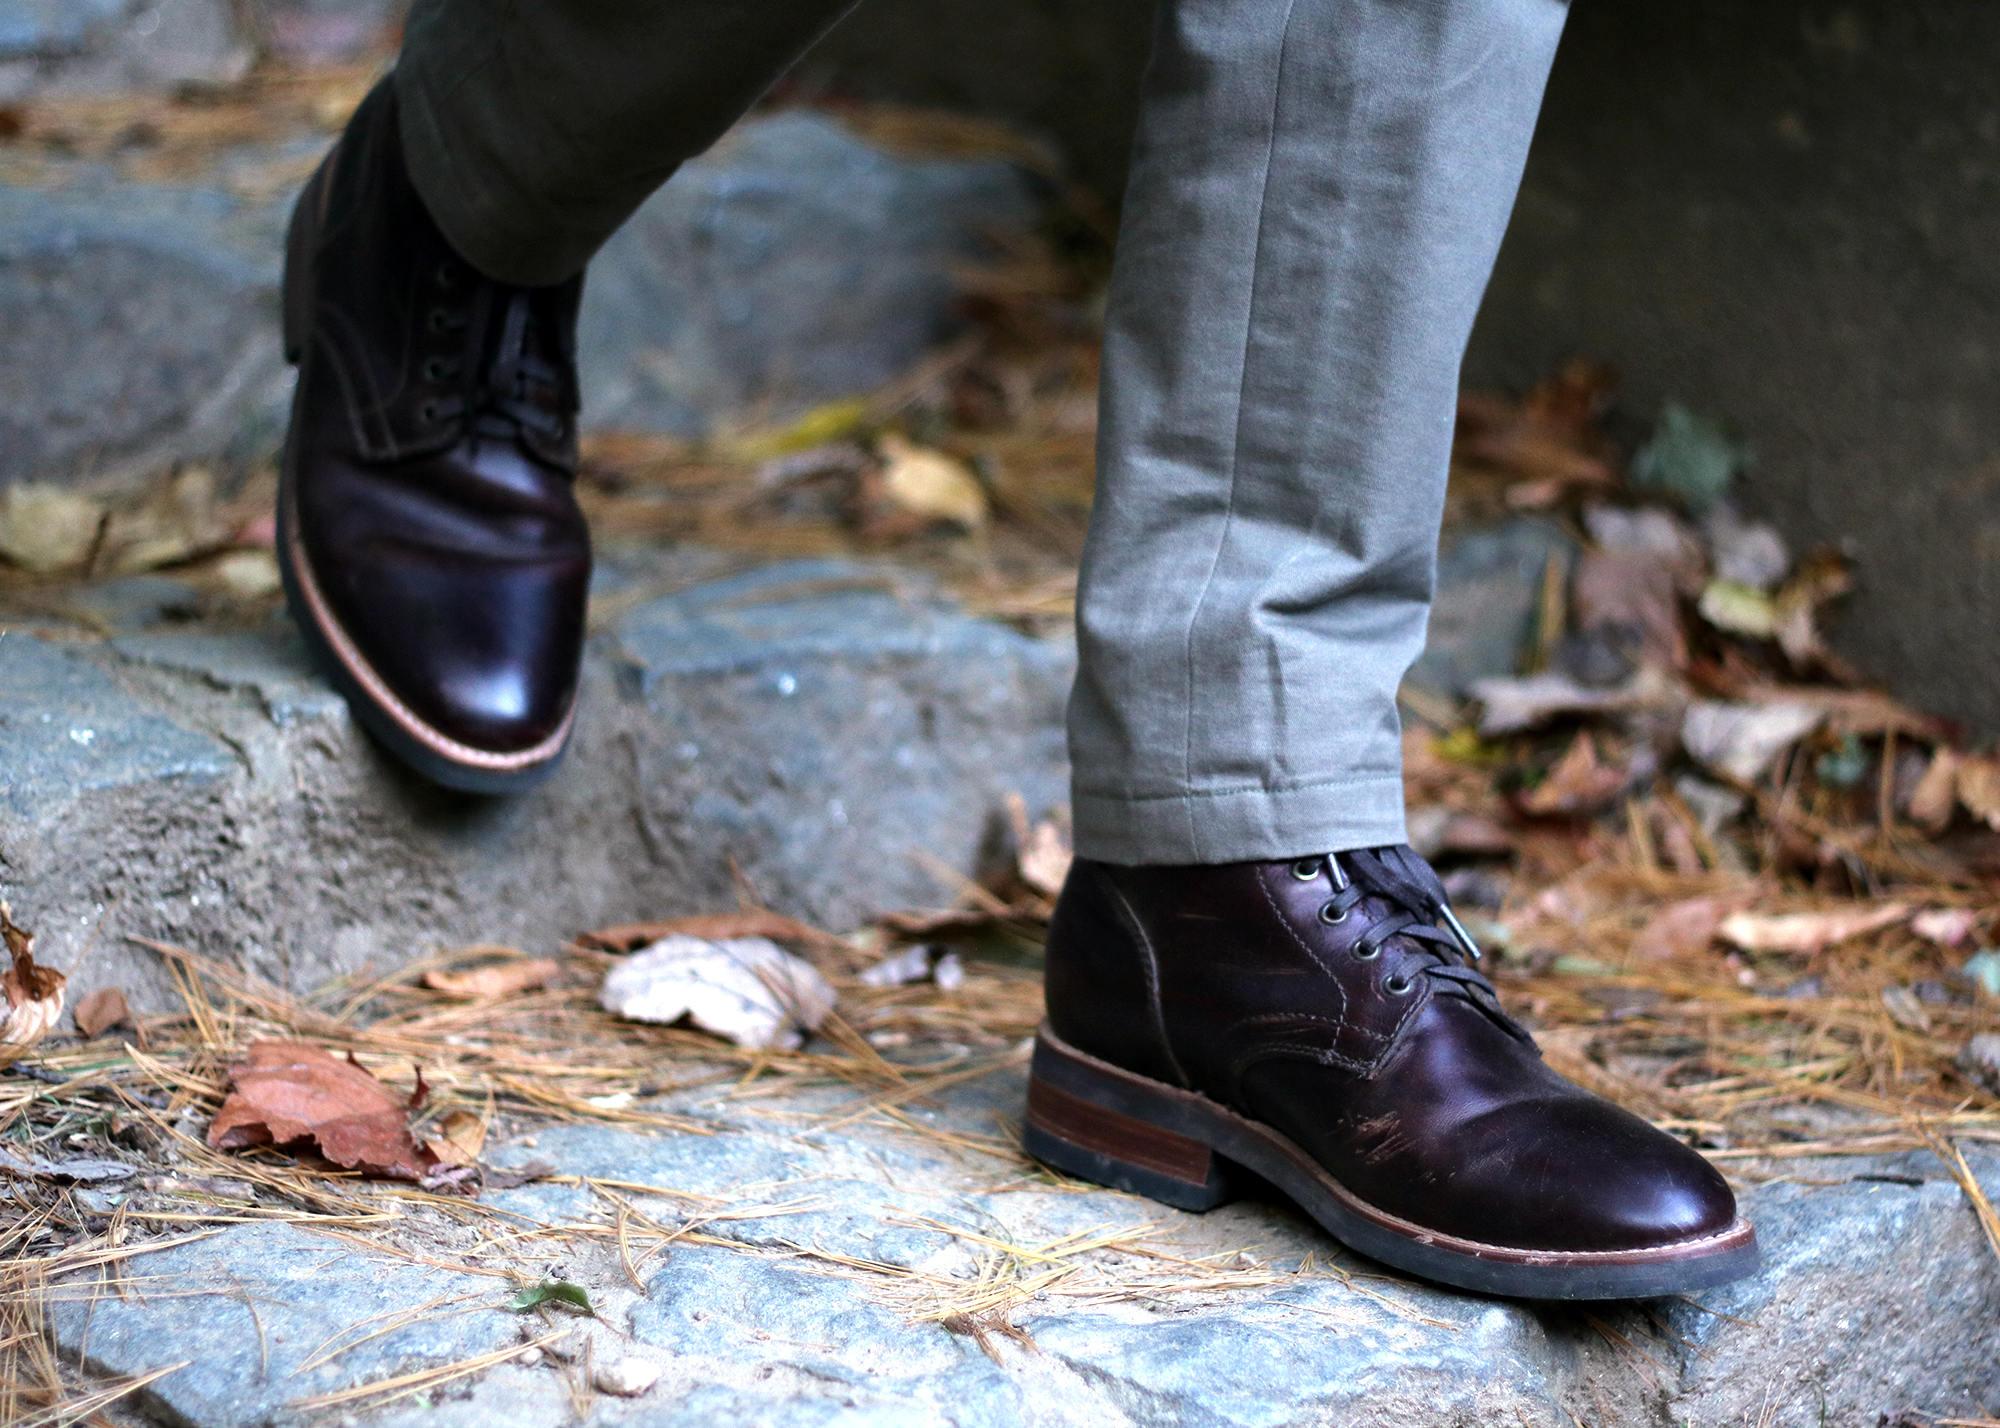 Thursday Boots work boots